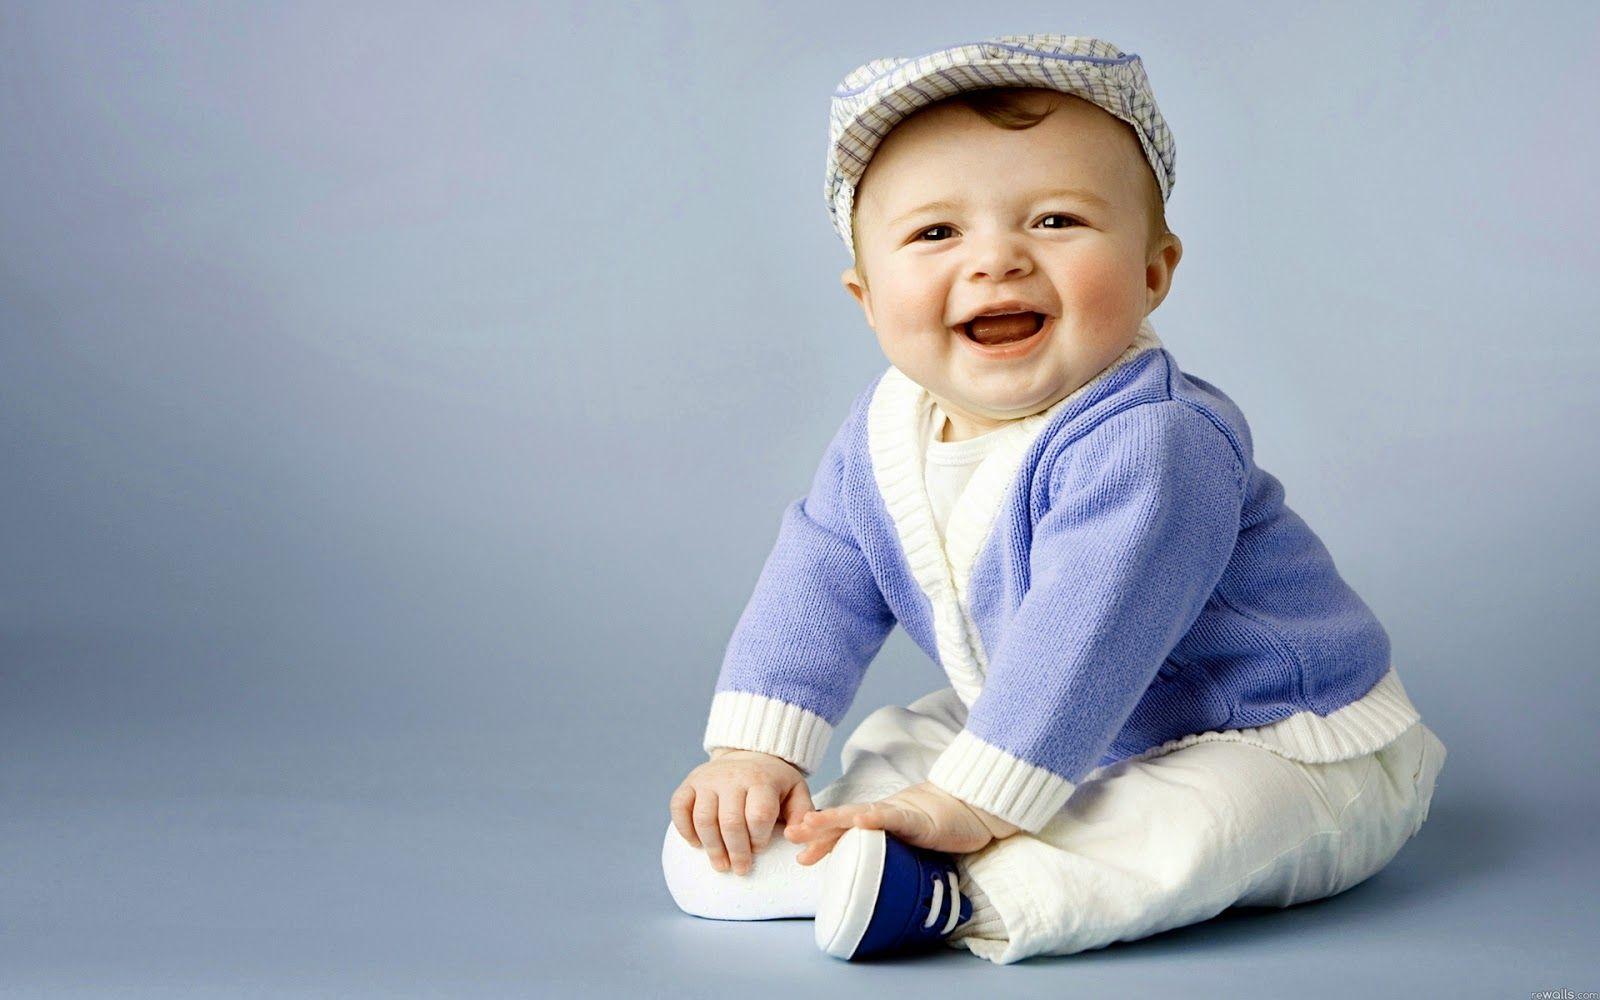 19 Cute Baby Boy Hd Wallpapers On Wallpapersafari